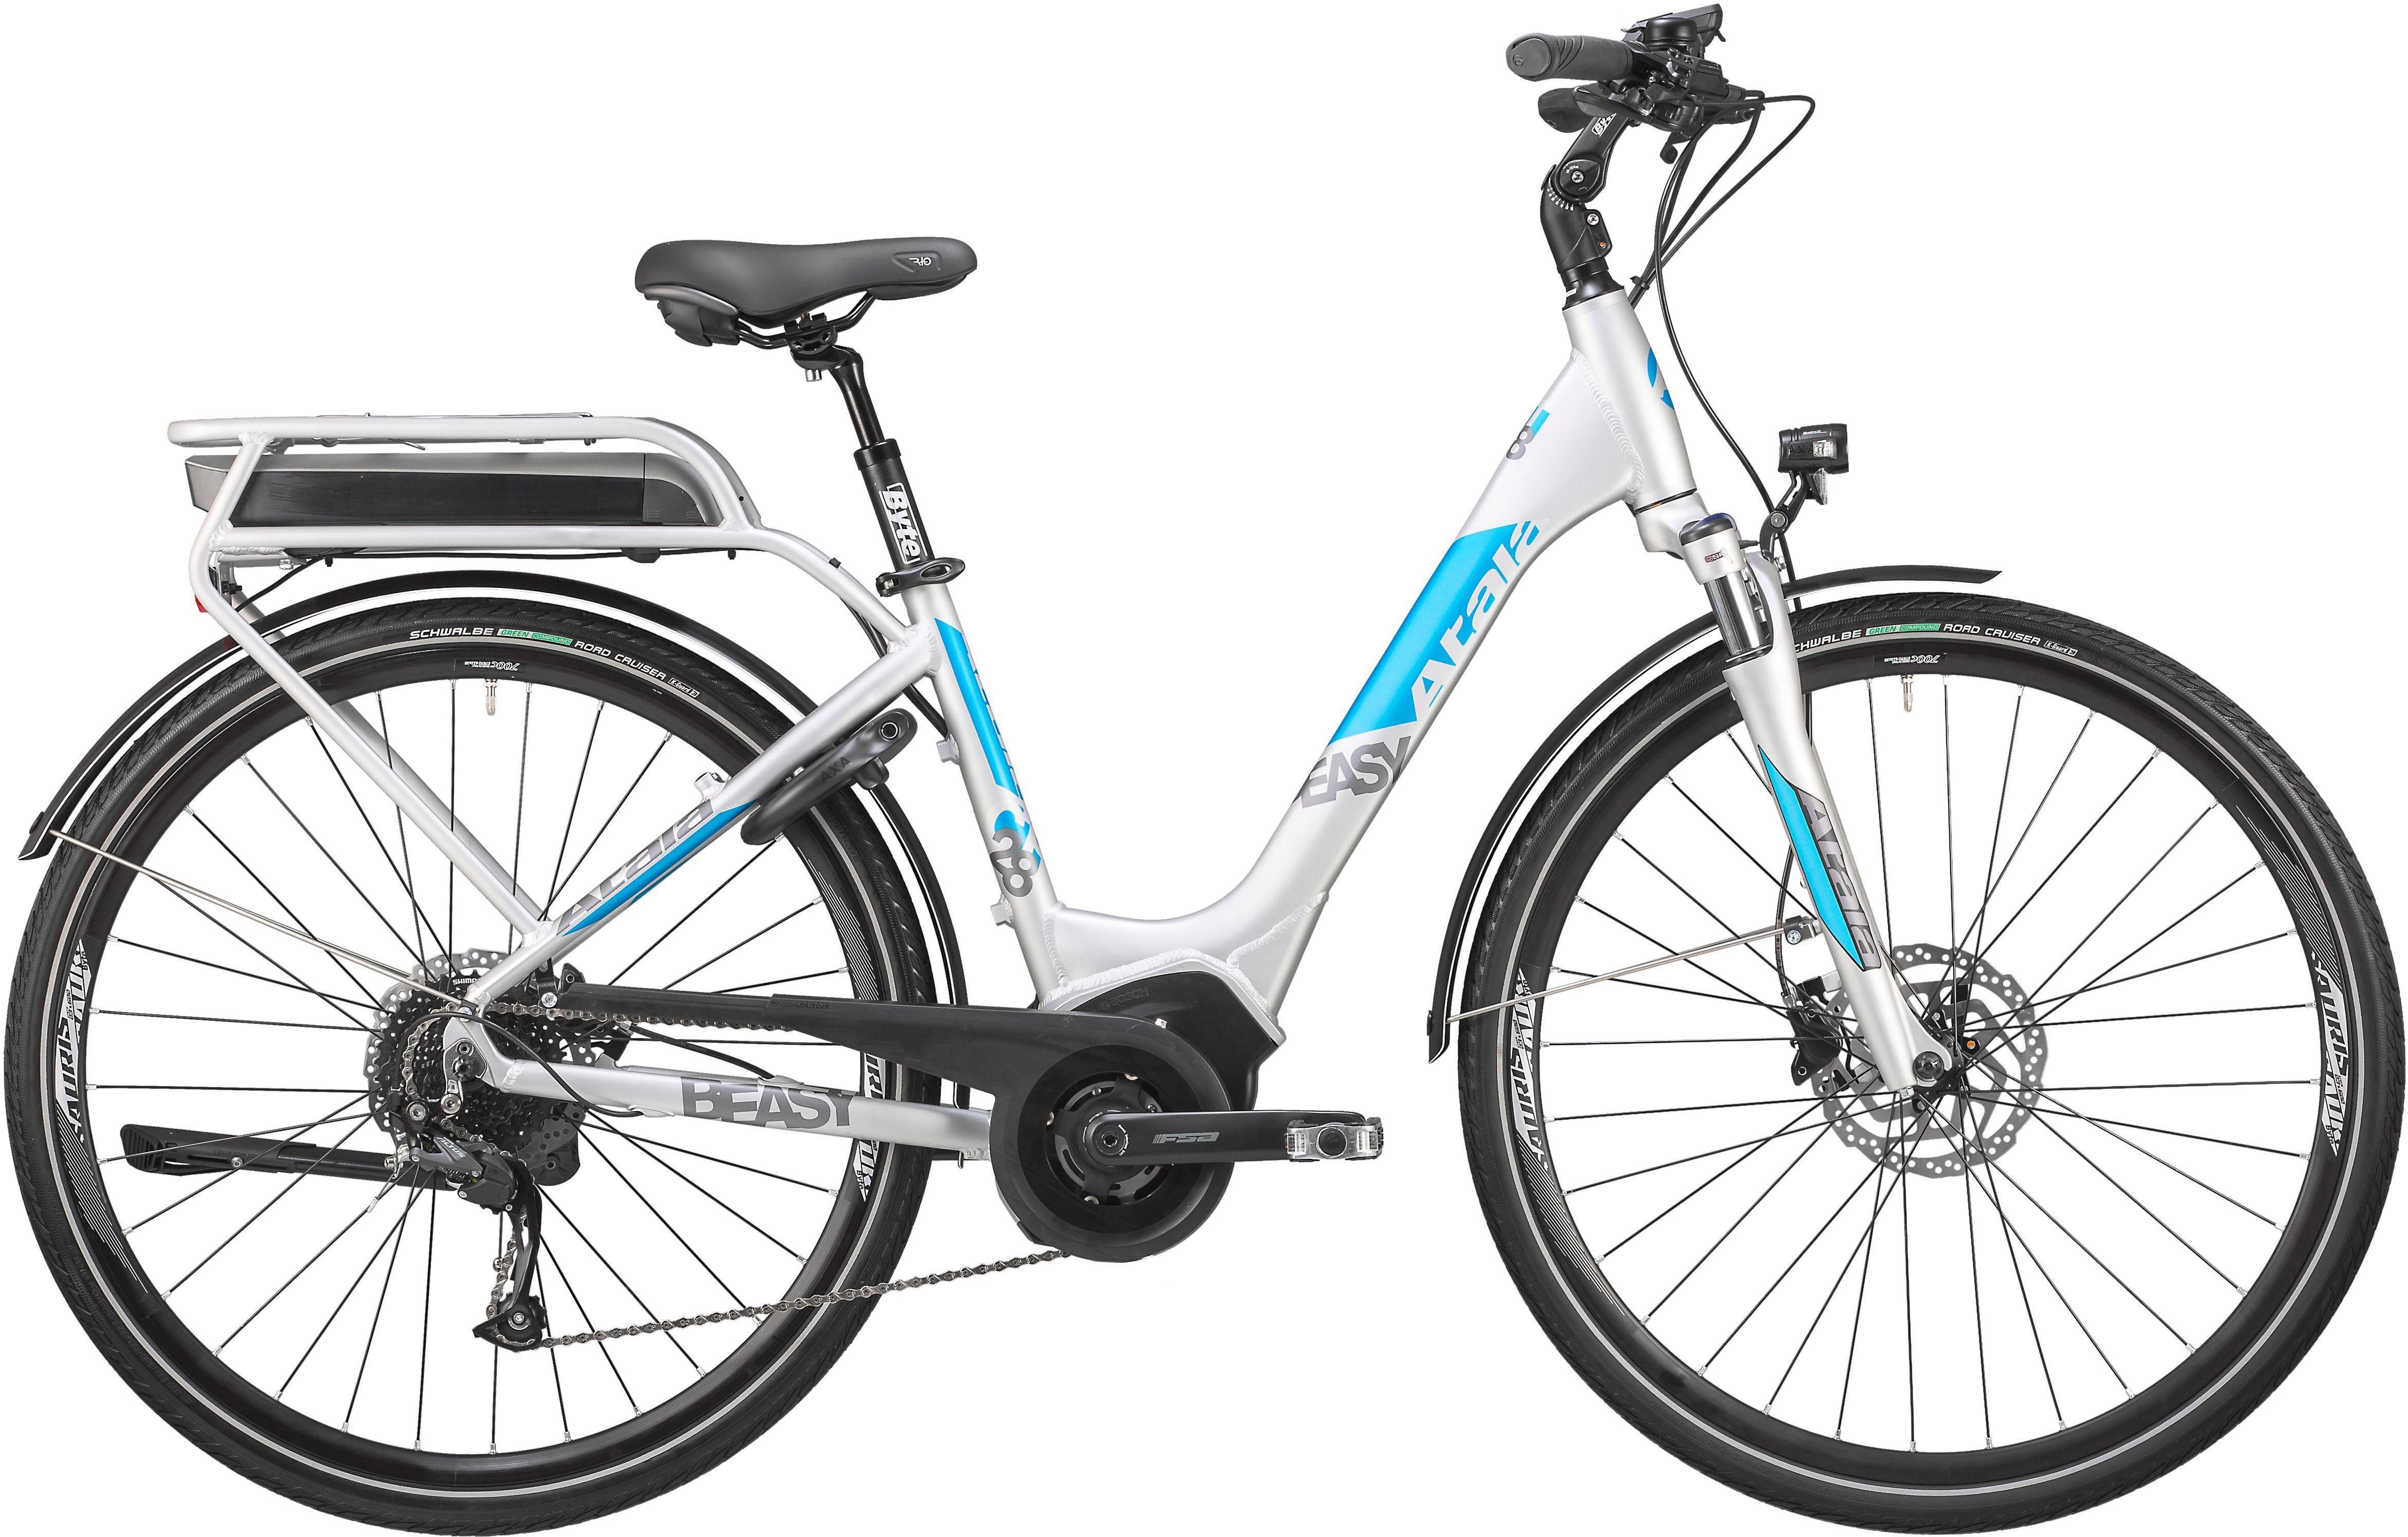 Atala E-Bike »B-Easy SL«, 9 Gang Shimano RD-M 2000 Schaltwerk, Kettenschaltung, Mittelmotor 250 W